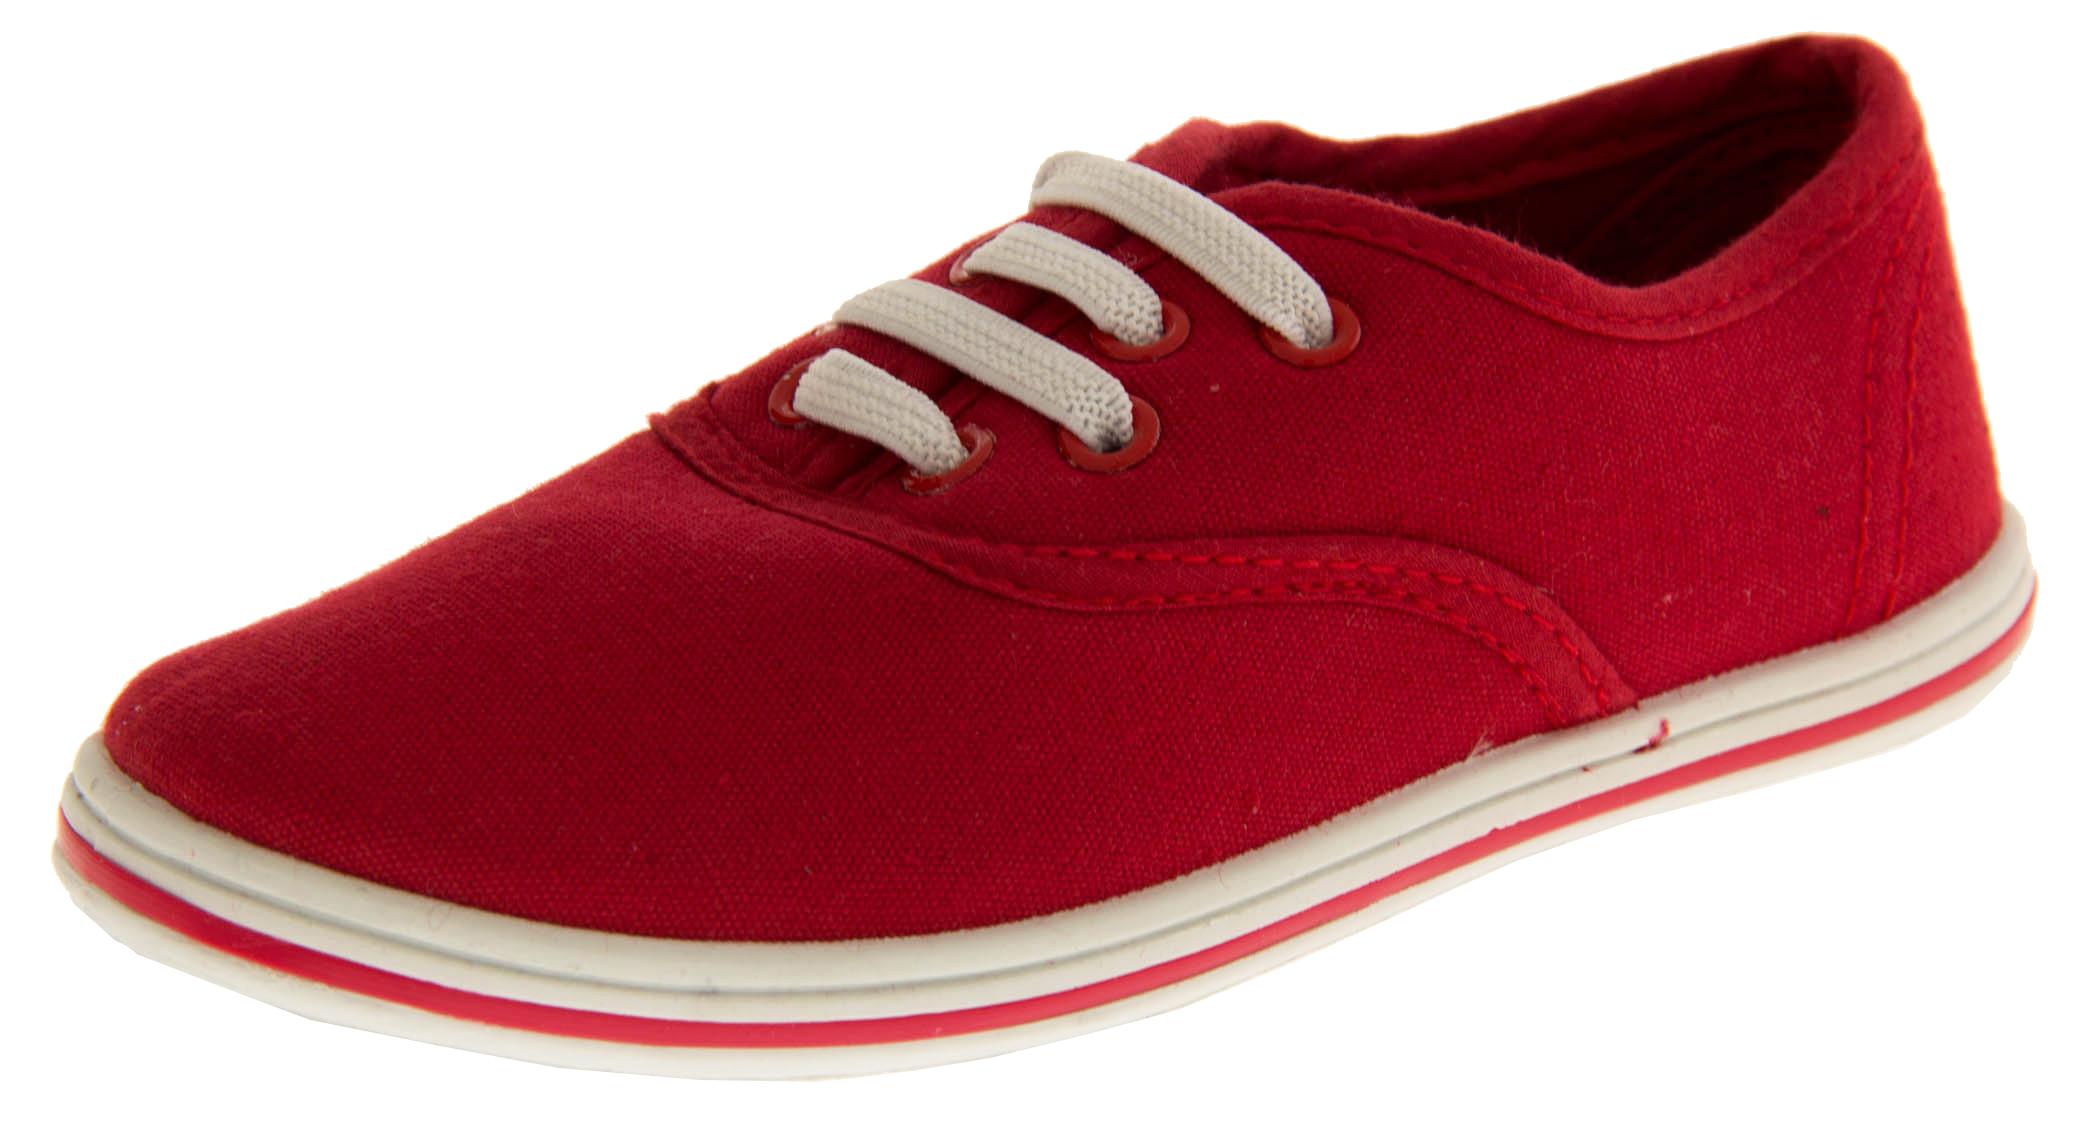 New Girls Kids Red Canvas Shoes Flats Shoe Plimsolls Flat Pumps Sz